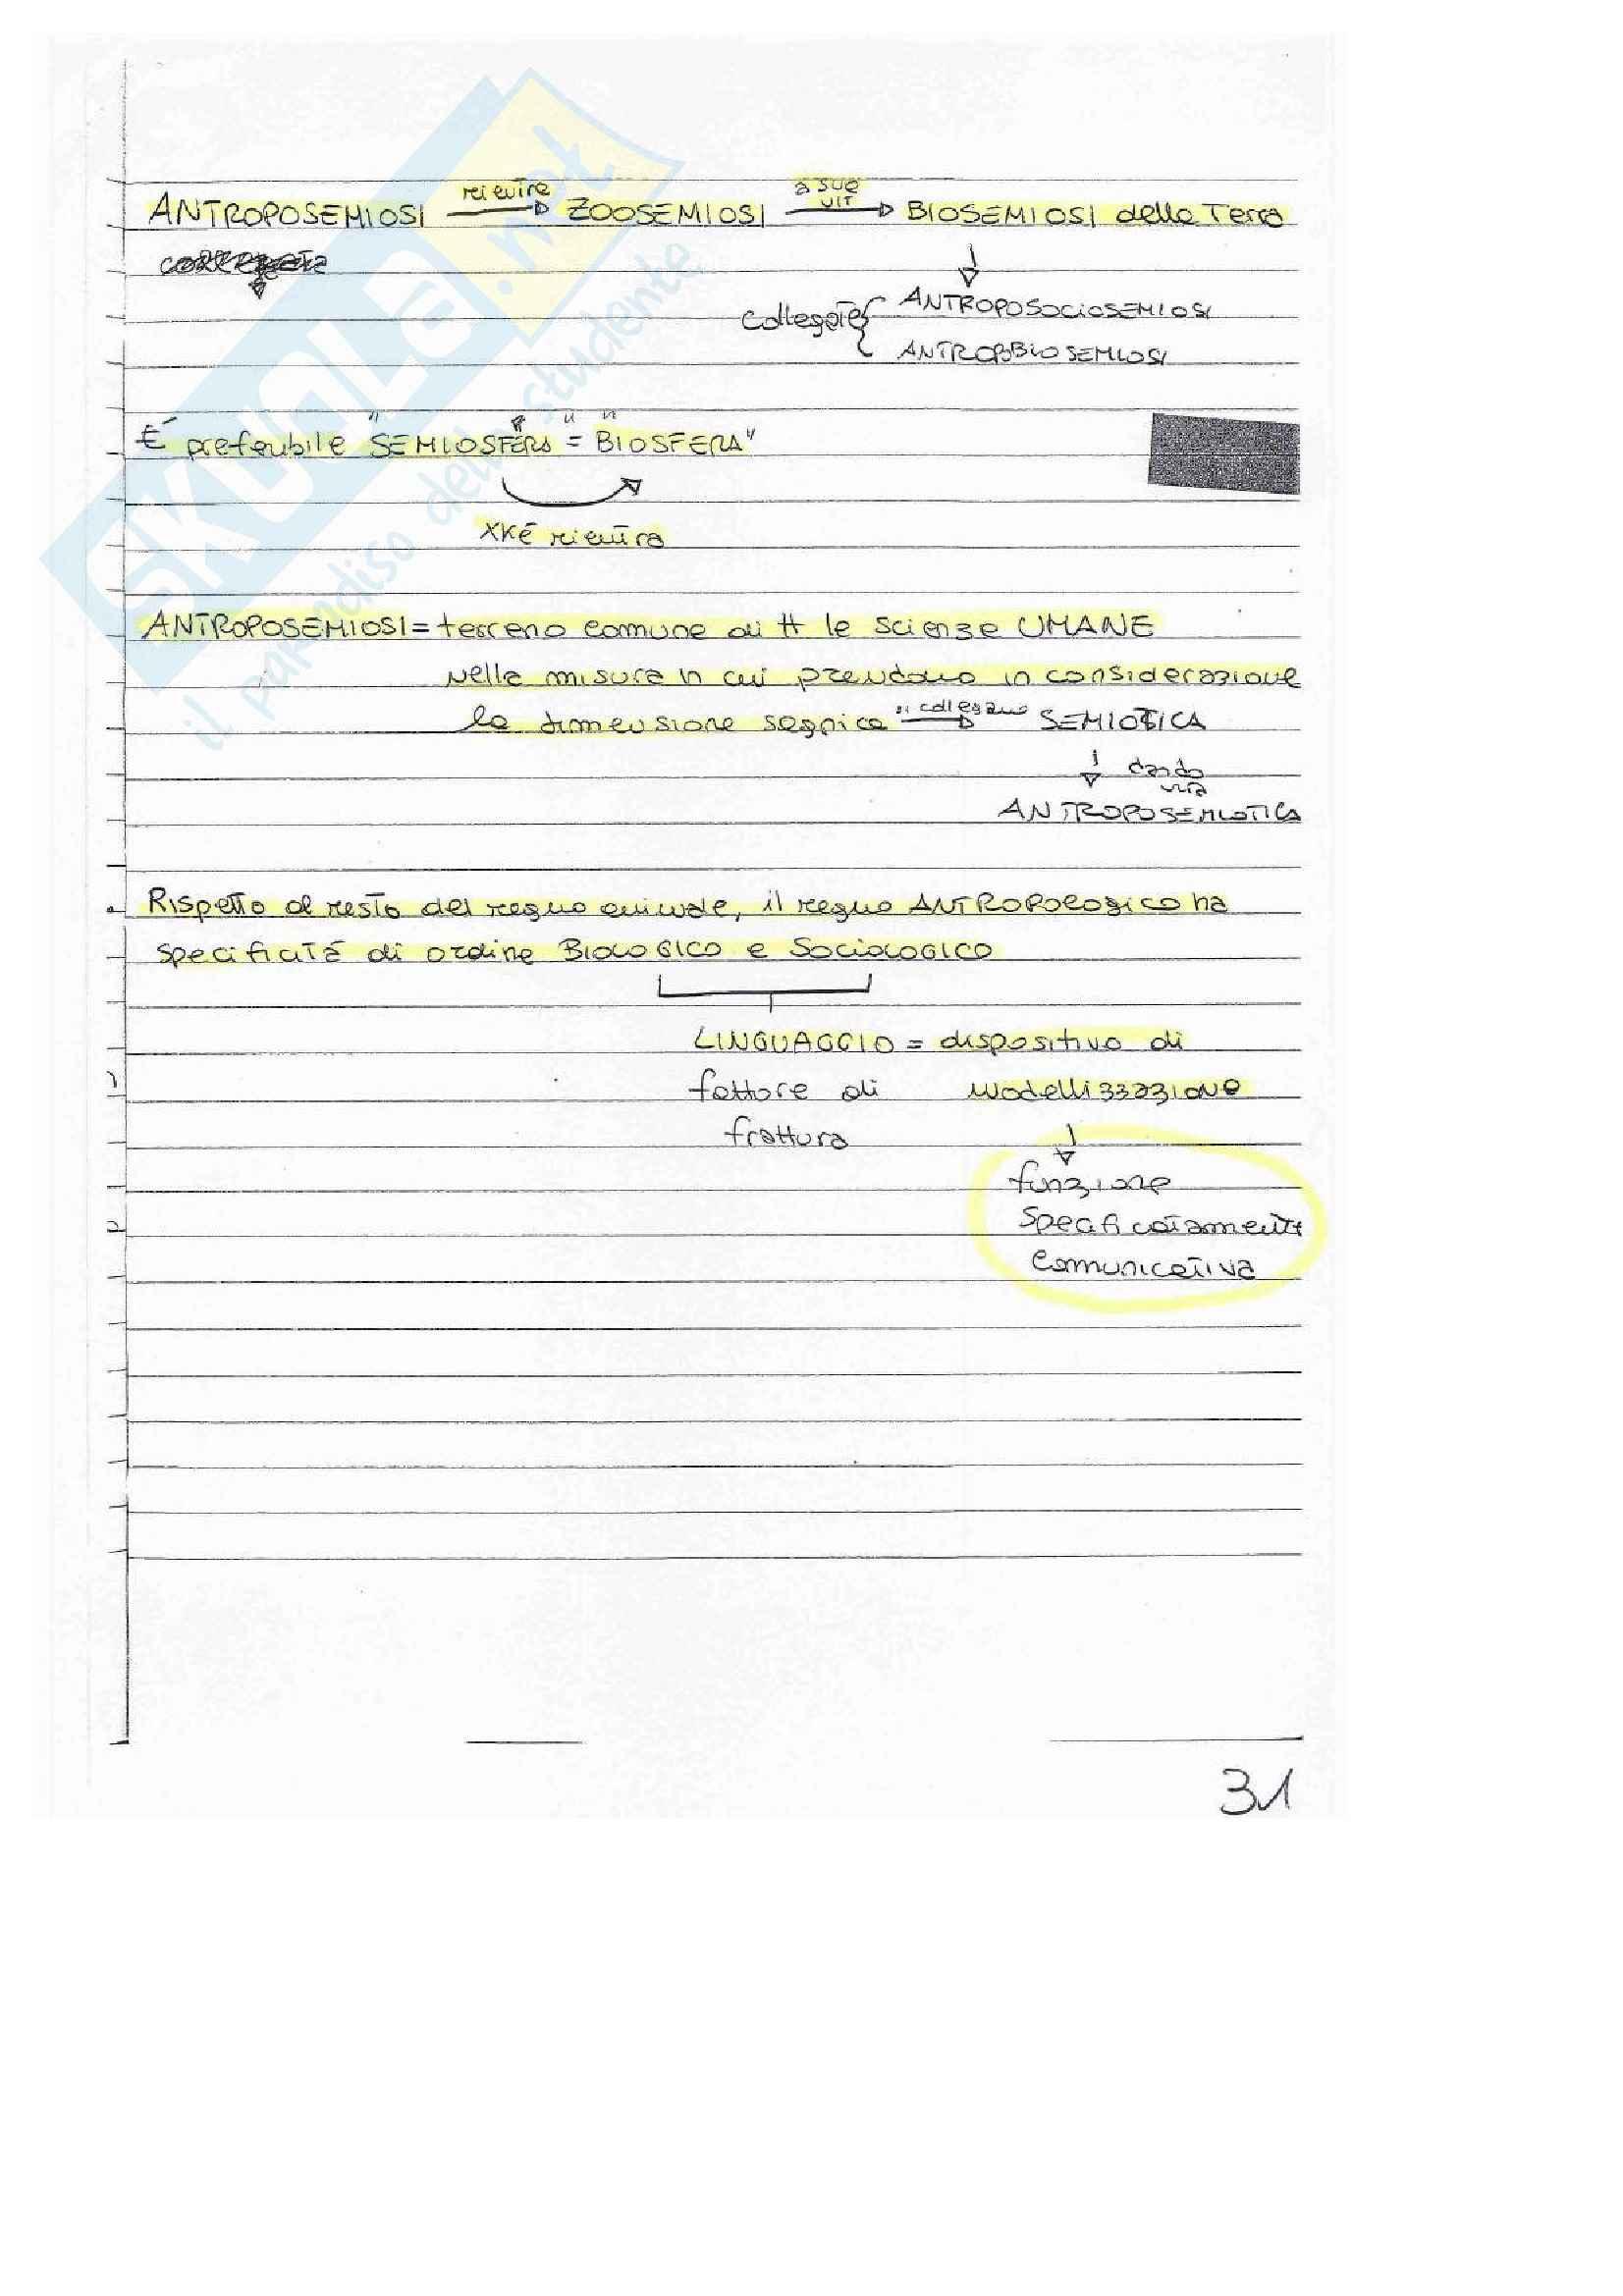 Semiotica, Appunti Pag. 31